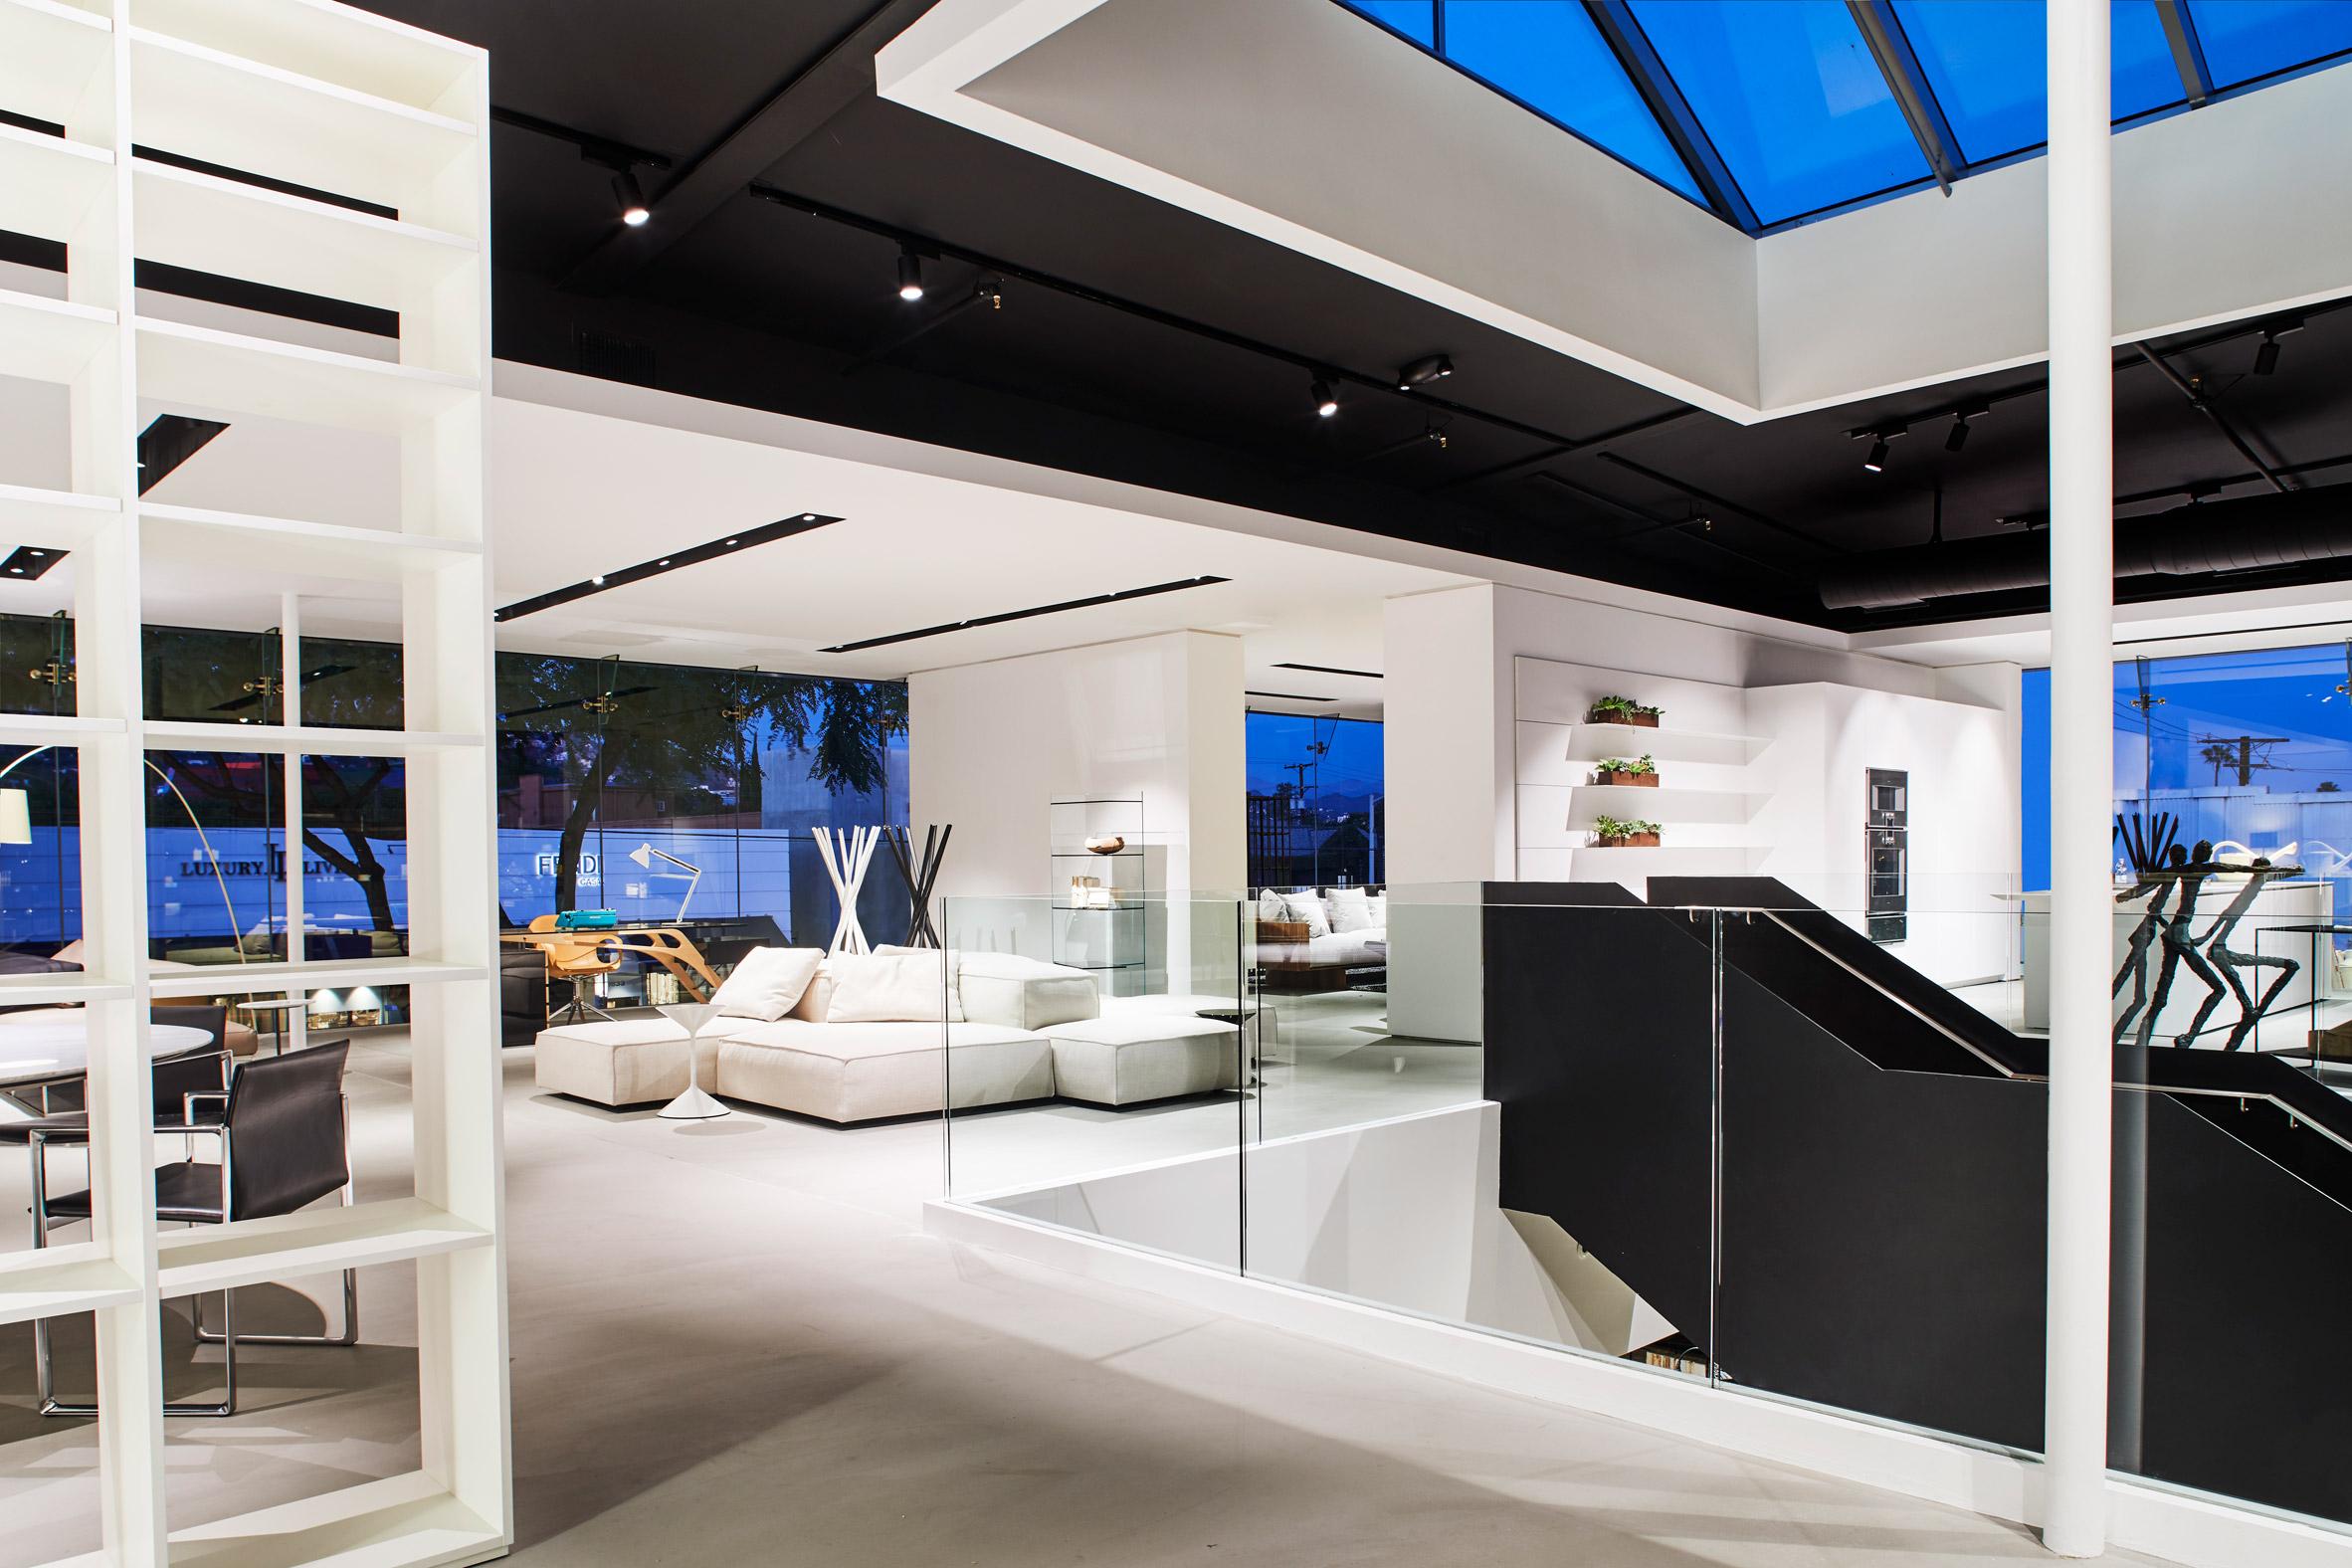 Luminaire Los Angeles Showroom